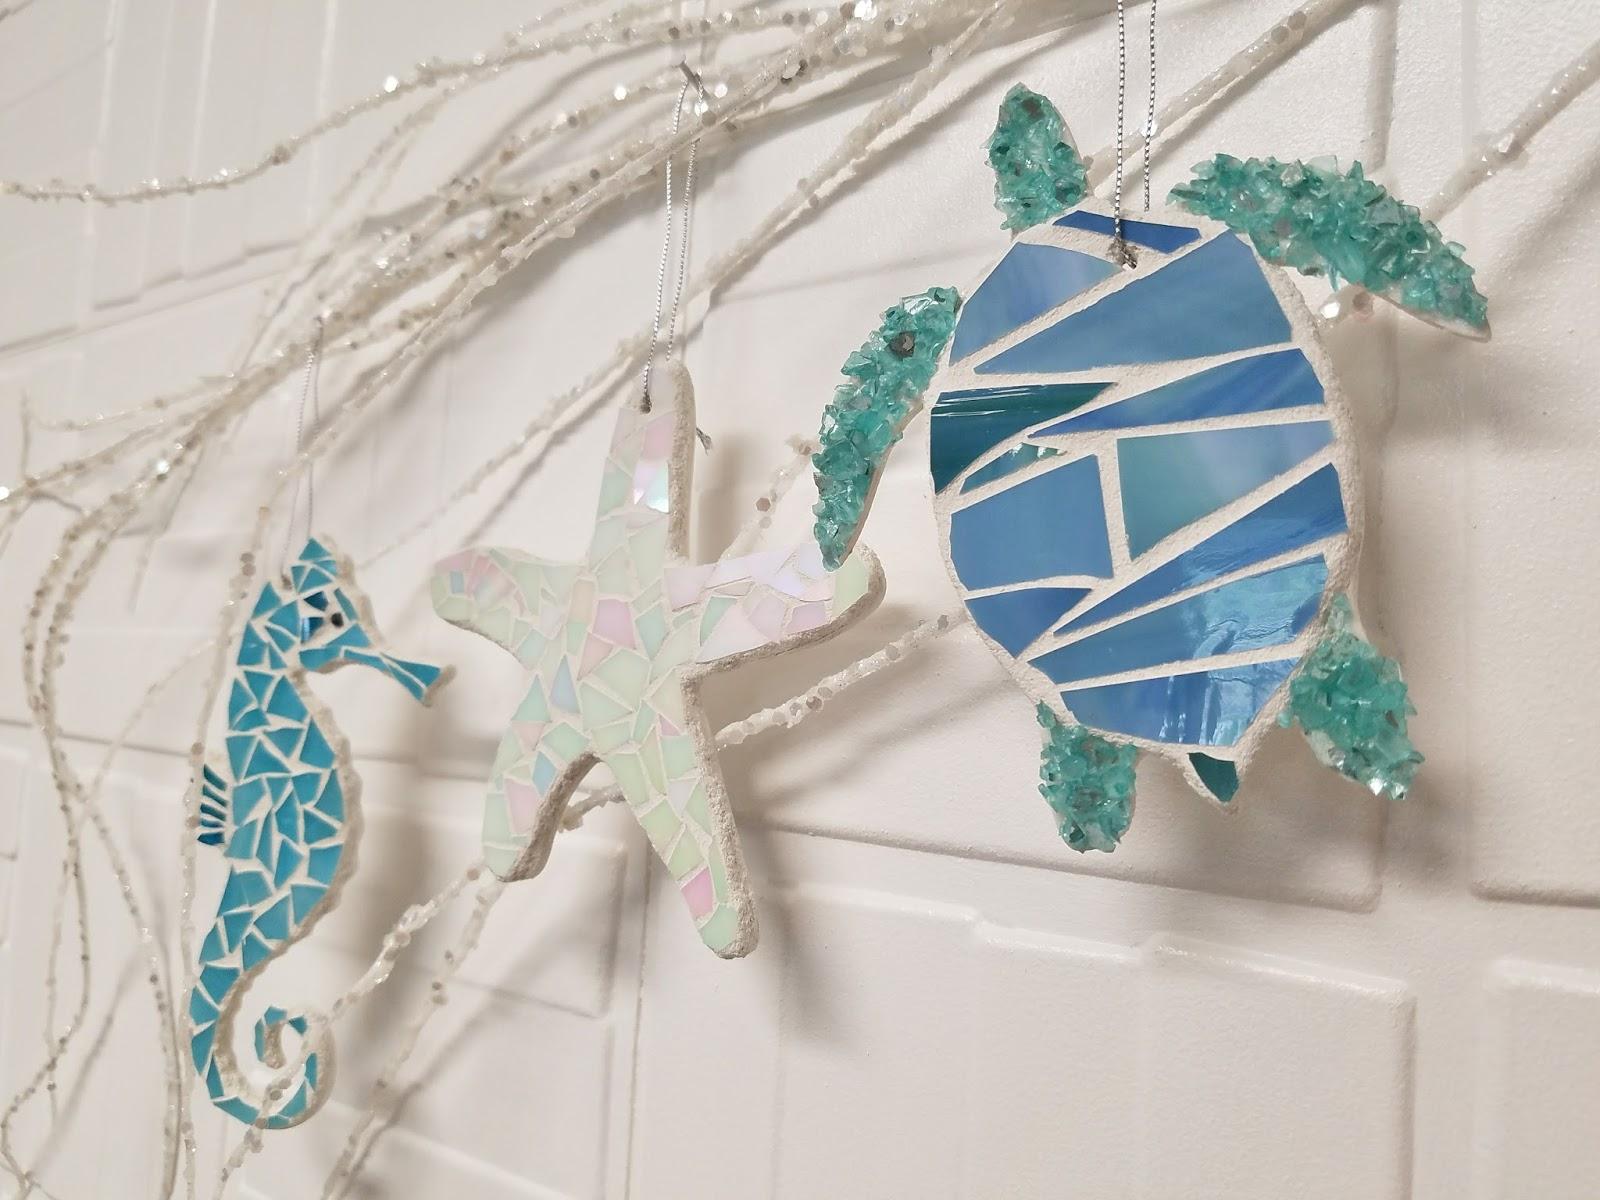 lucydesignsartcom coastal beach stained glass mosaic ornaments - Coastal Christmas Stockings